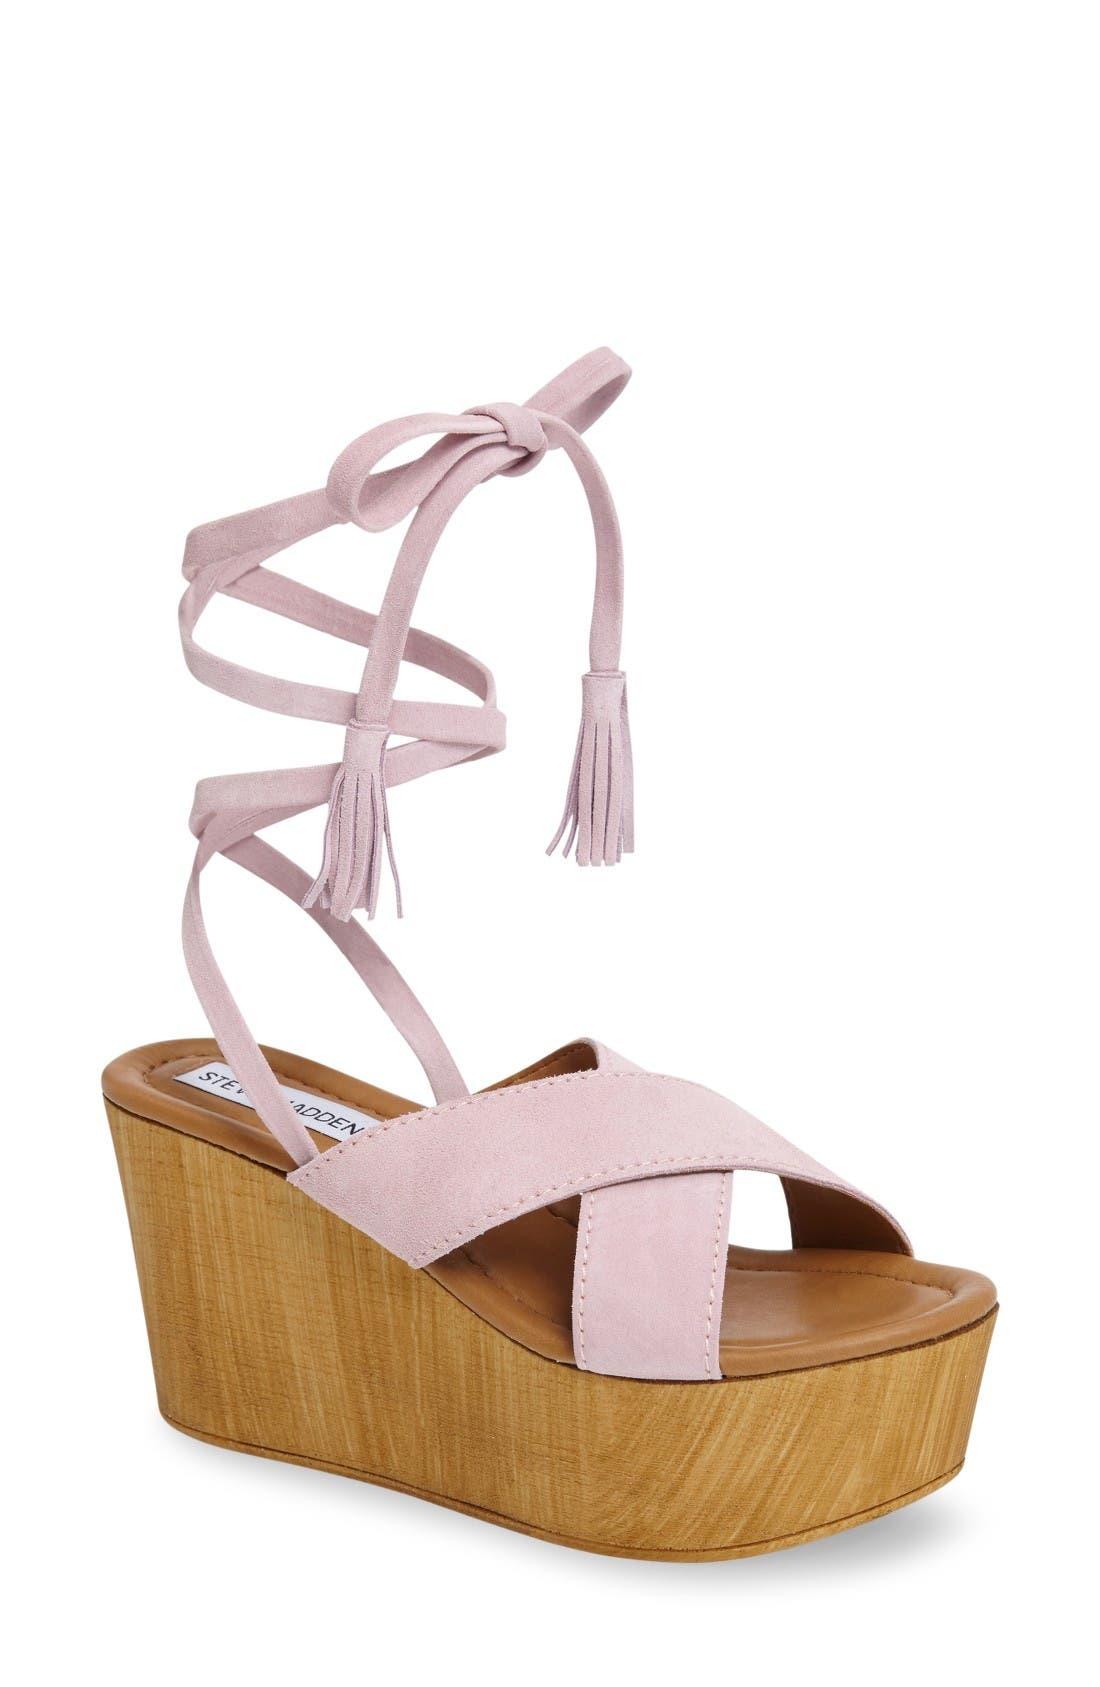 Main Image - Steve Madden Shella Platform Sandal (Women)